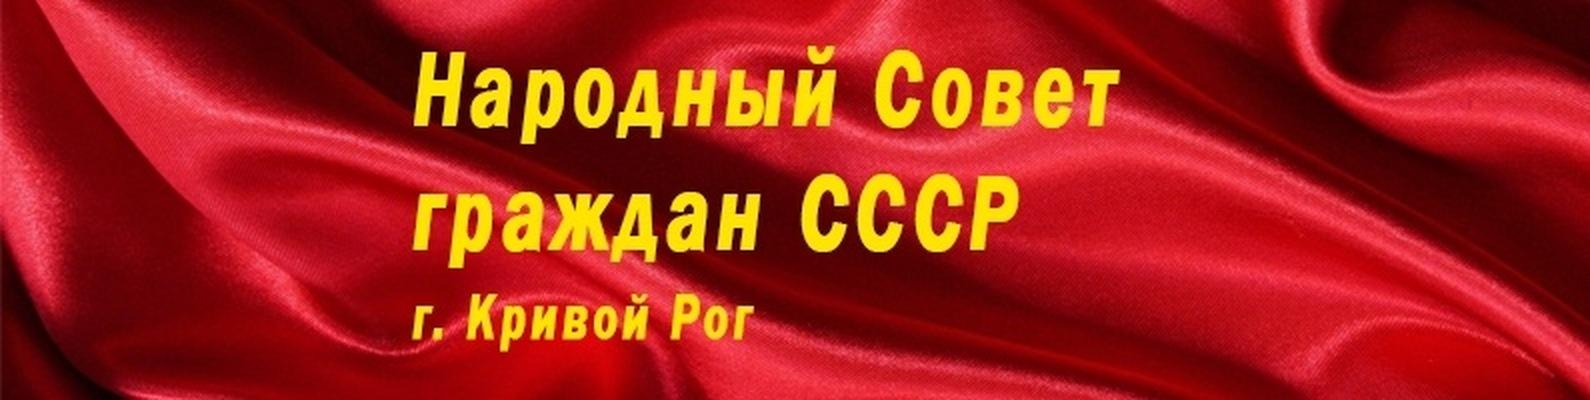 Narodnyj Sovet Sssr Krivoj Rog Vkontakte